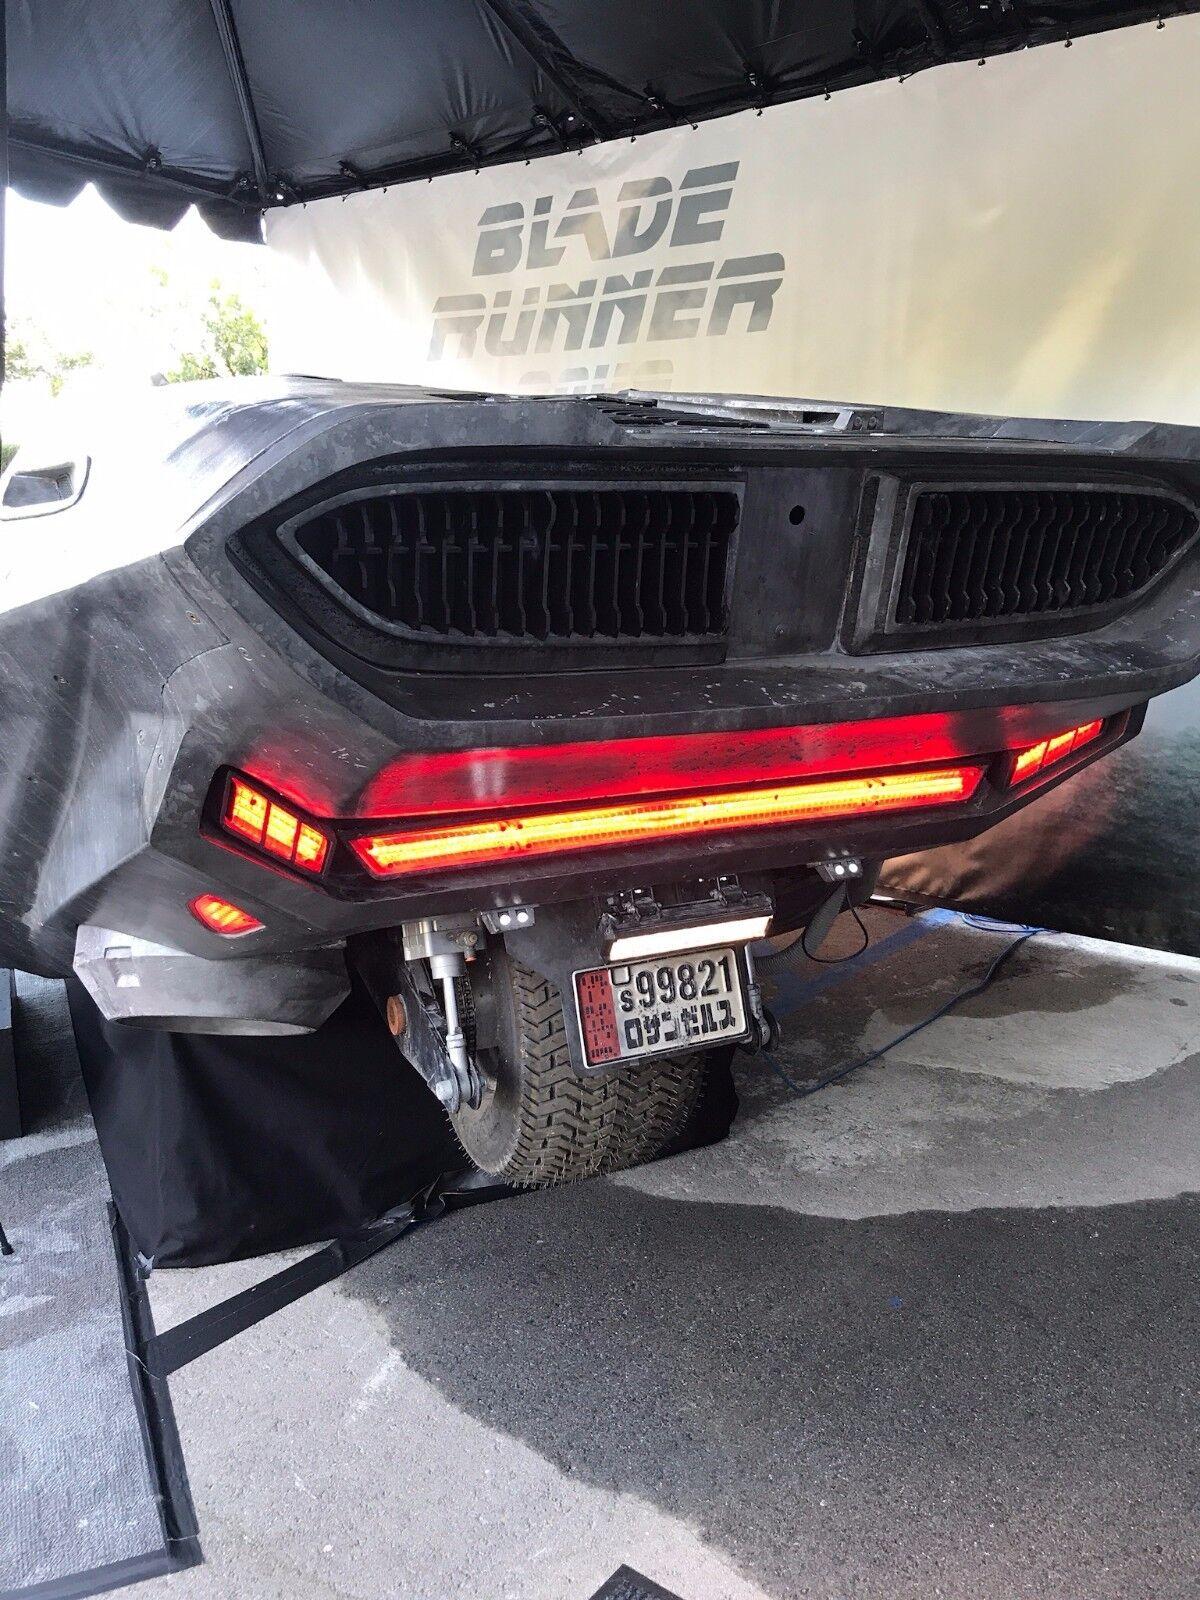 Blade Runner 2049 | Ryan Gosling Officer Ks Spinner | STAMPED Prop License Plate